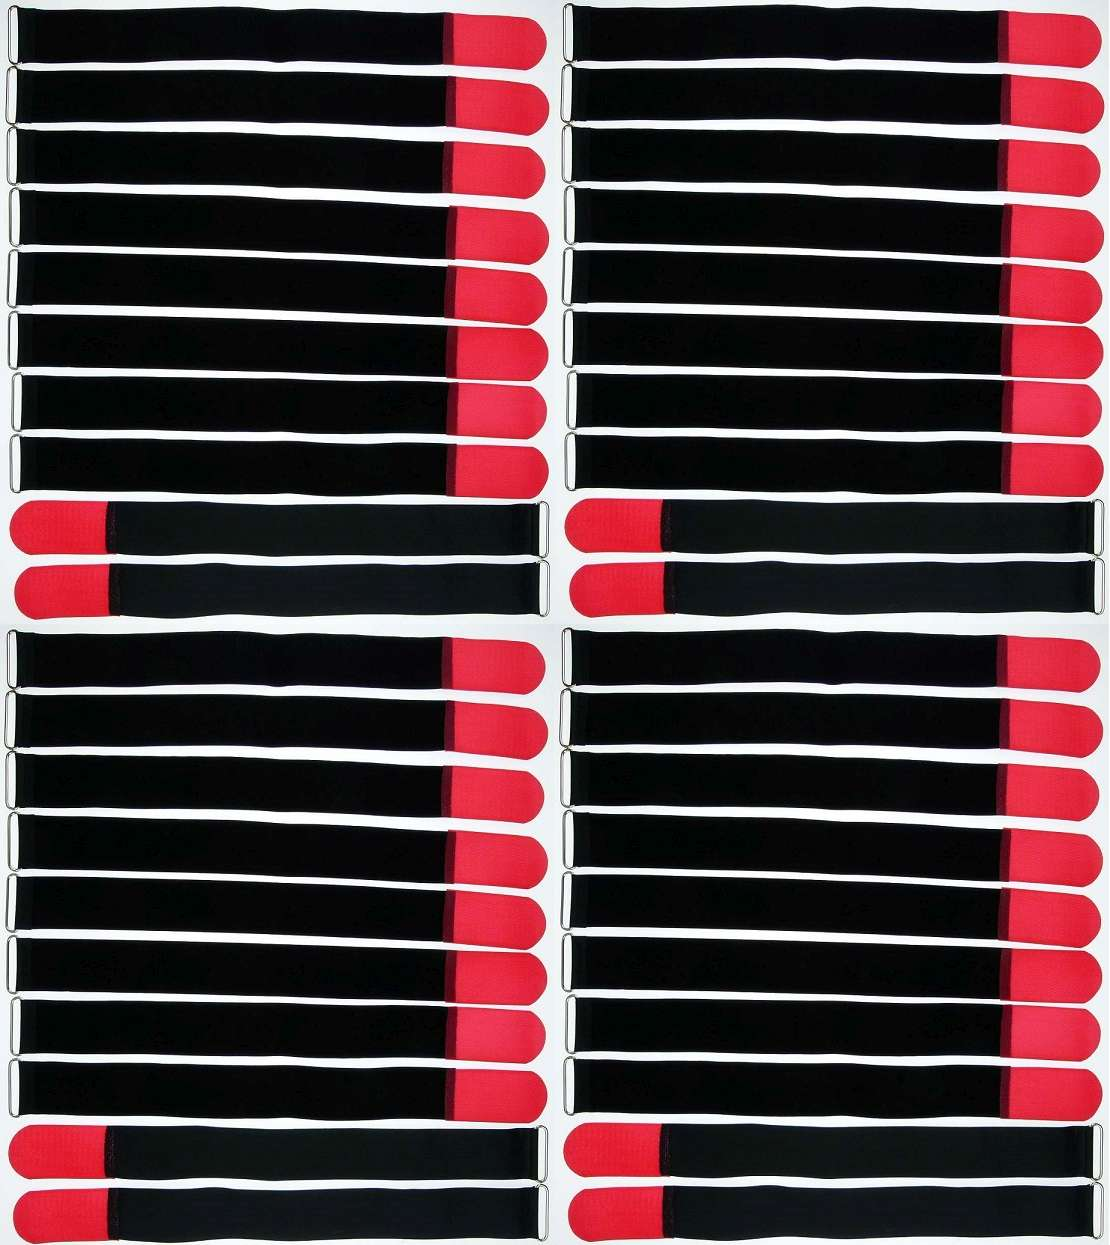 50 x Klettkabelbinder 500 x 50 mm neonrot Kabelbinder Kabel Klettband Kabelklett